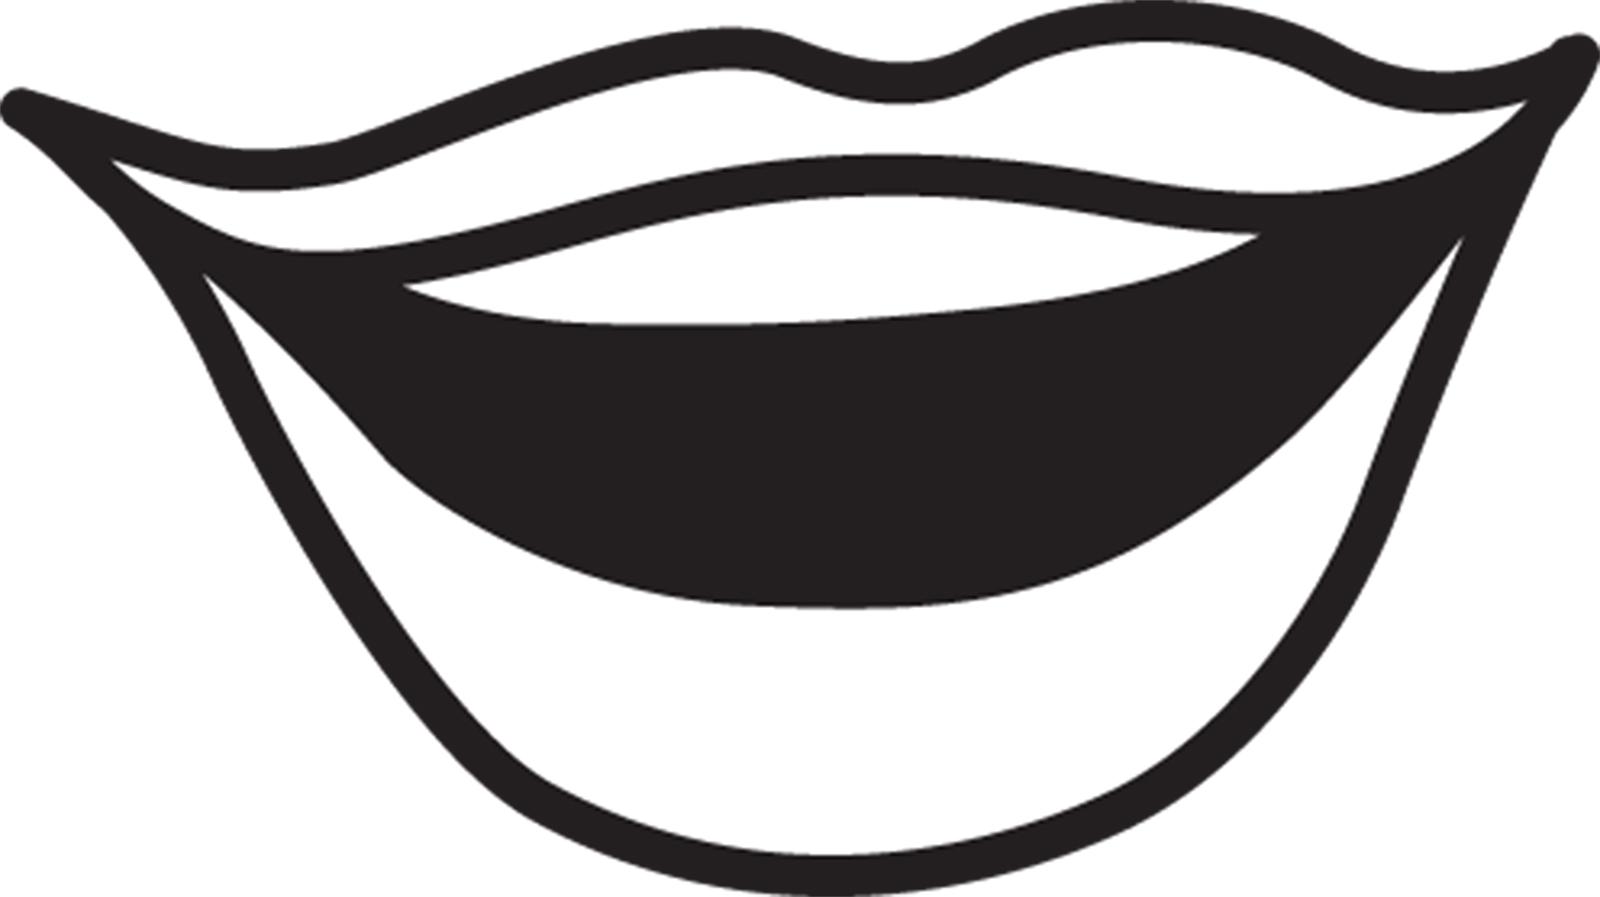 Tongue clipart outline #4